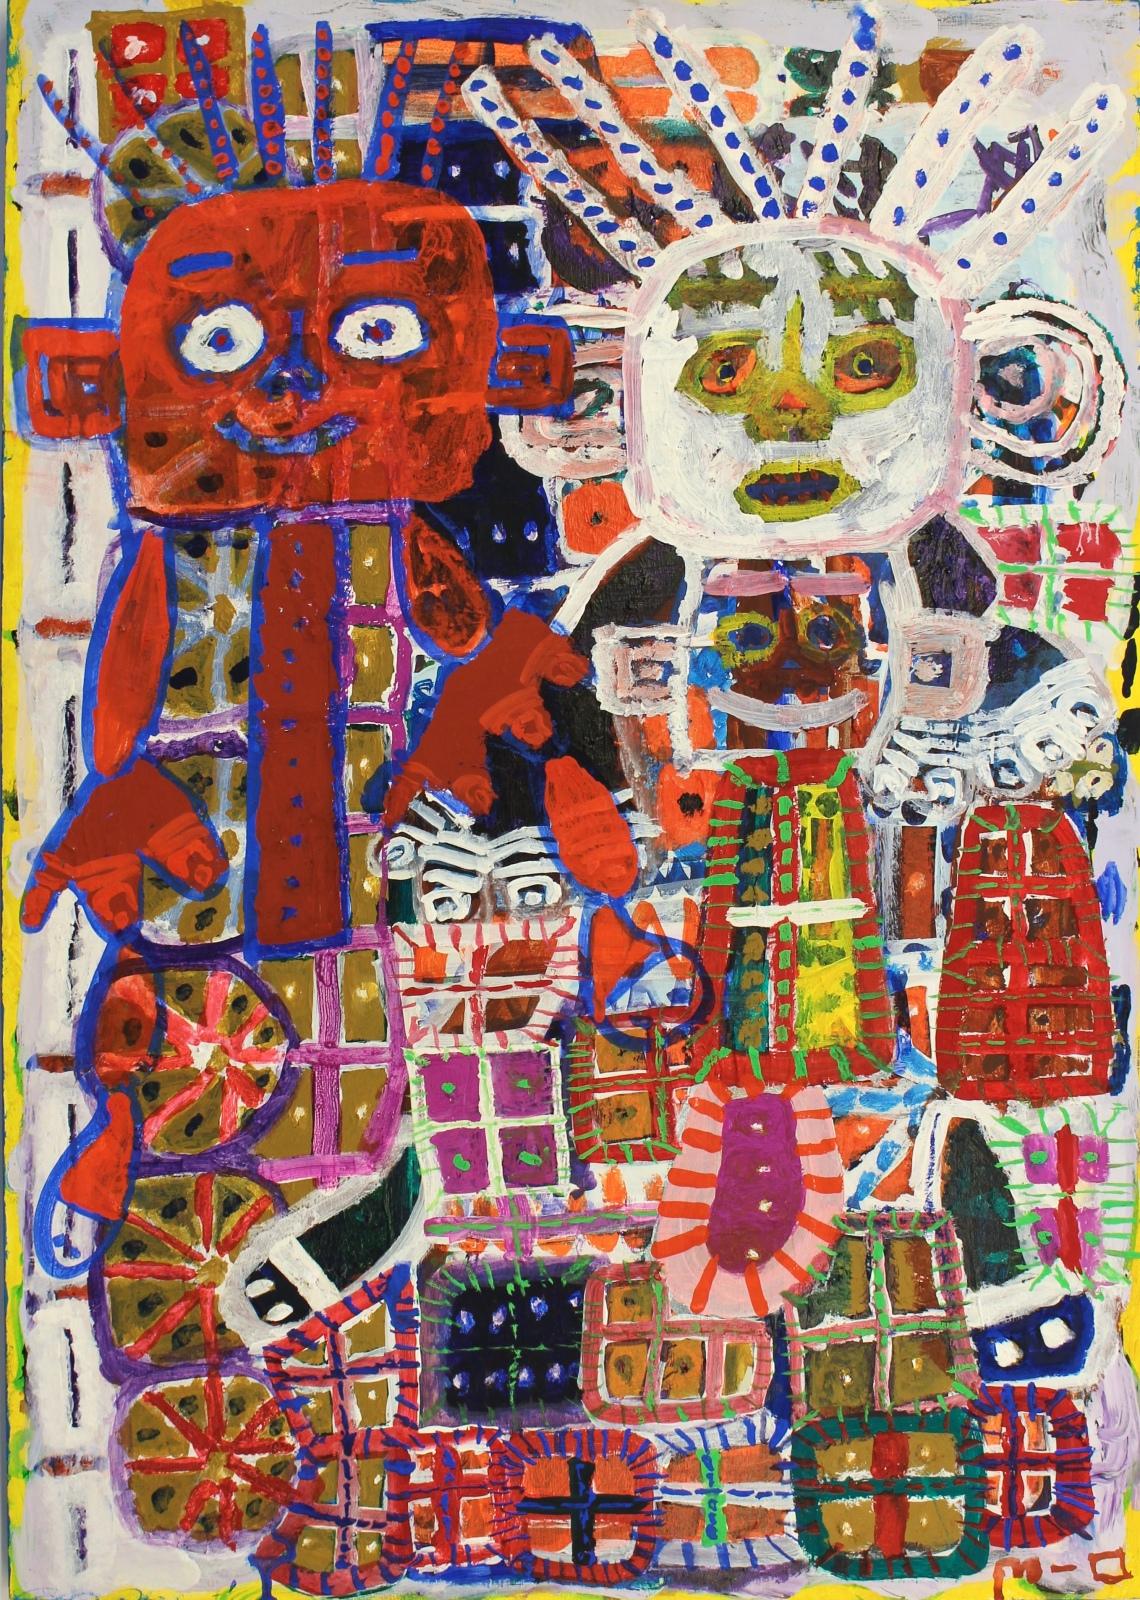 Makoto Okawa, Red Man and White Man, 2007, 72 x 52 cm